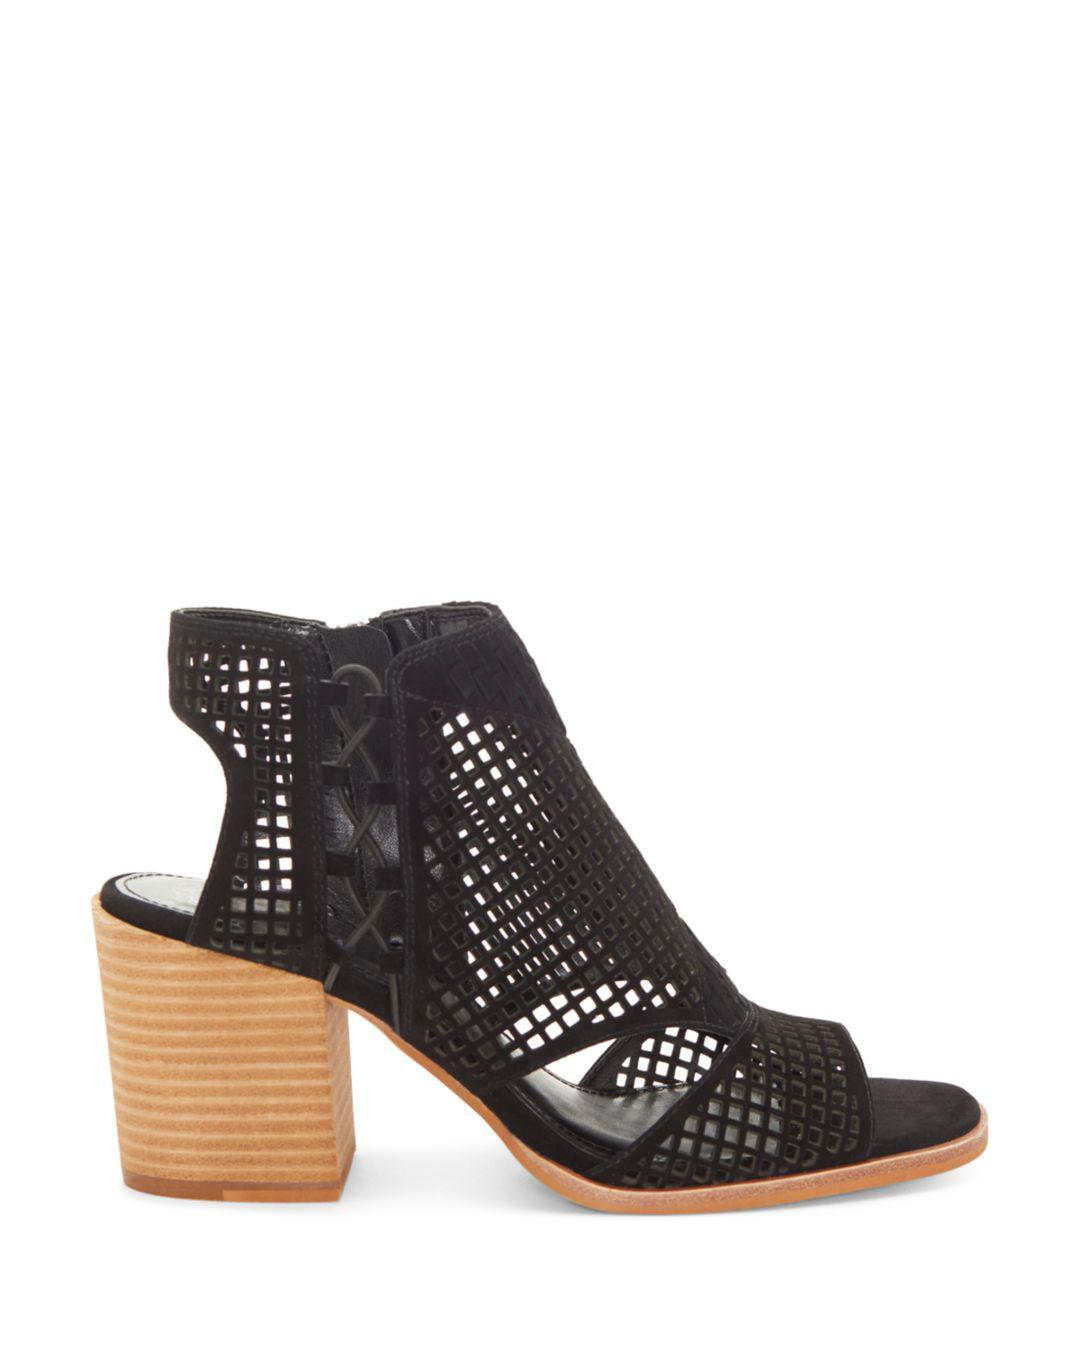 c36f1ea66b4 Lyst - Vince Camuto Women s Kampbell Mesh Block Heel Sandals in Black - Save  40%